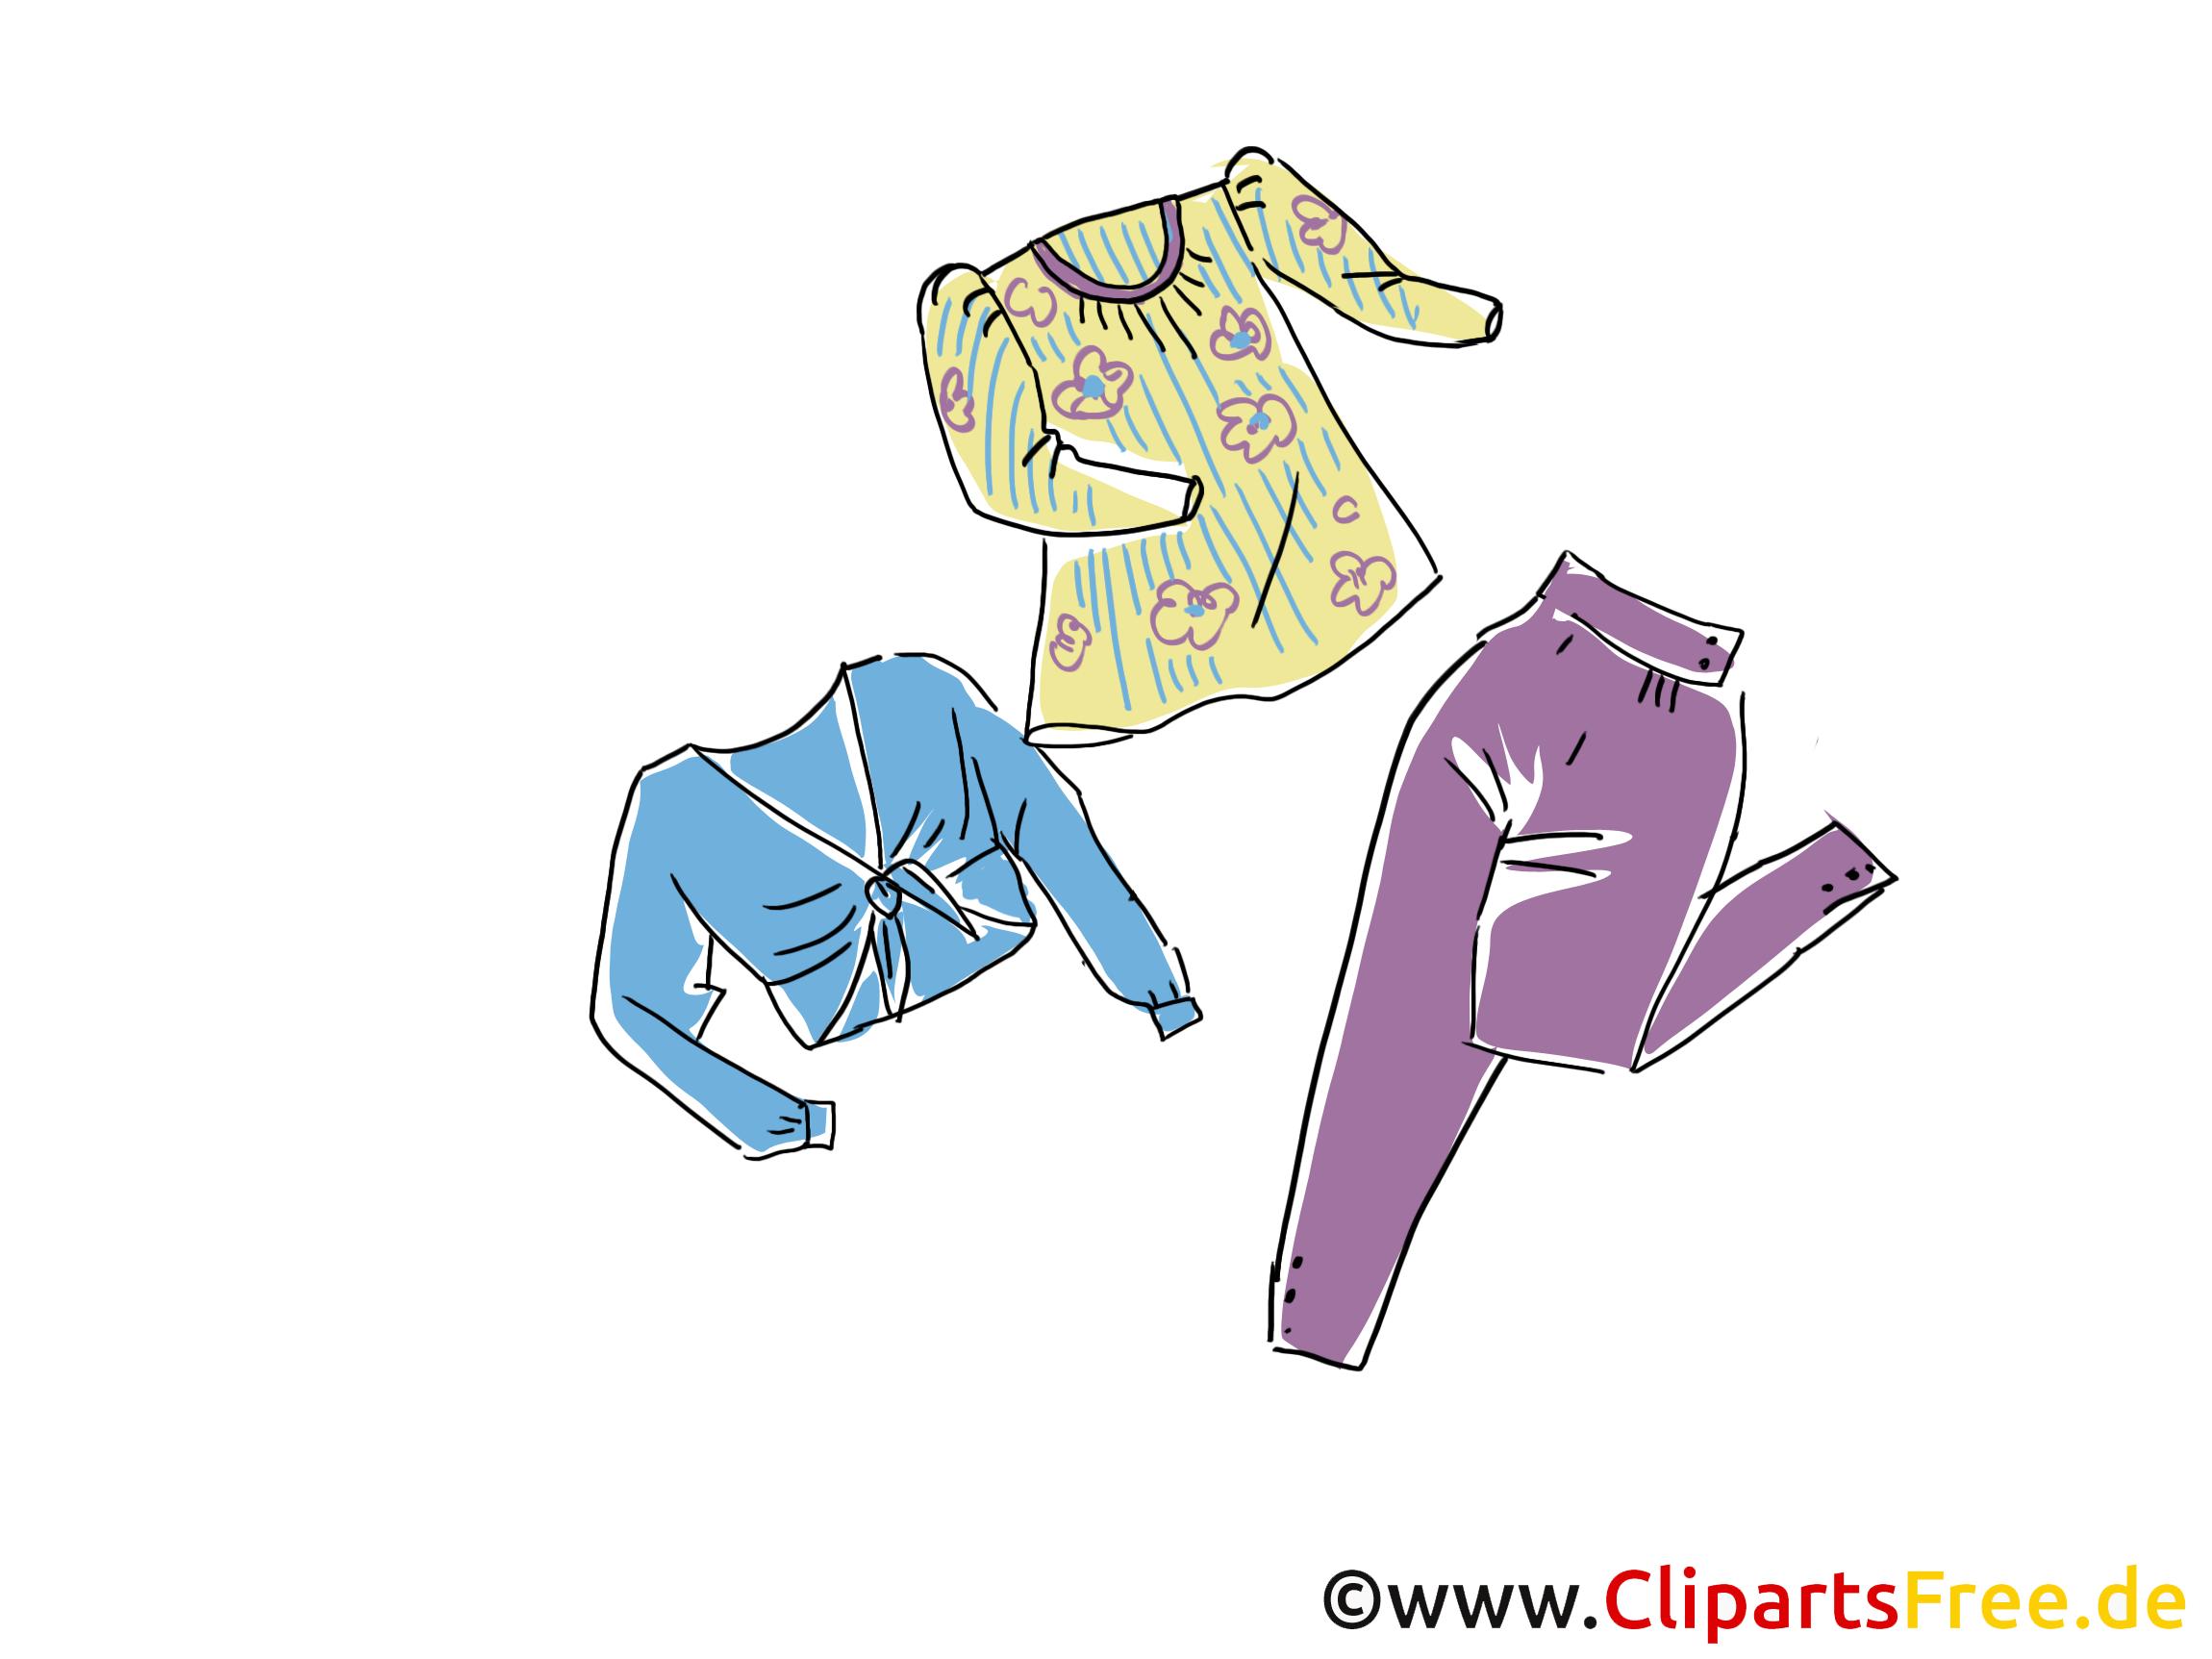 Mode online Clipart, Bild, Illustration, Grafik,  Image kostenlos